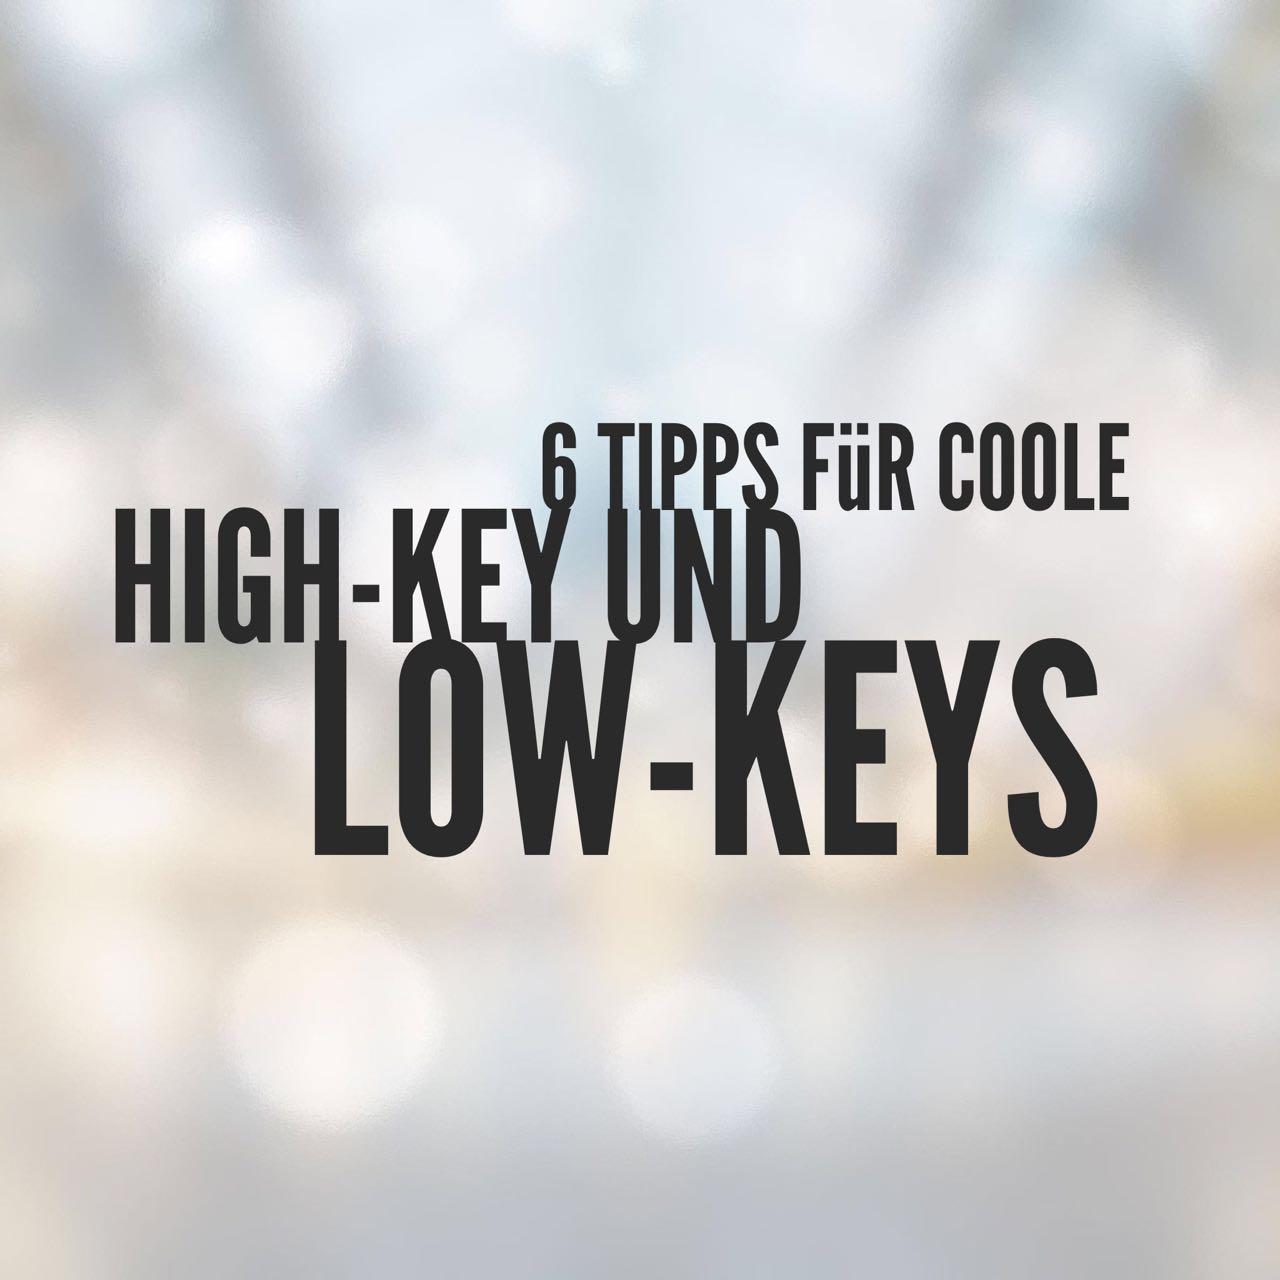 6 tipps f r bessere high key und low key fotos ig fotografie foto blog. Black Bedroom Furniture Sets. Home Design Ideas